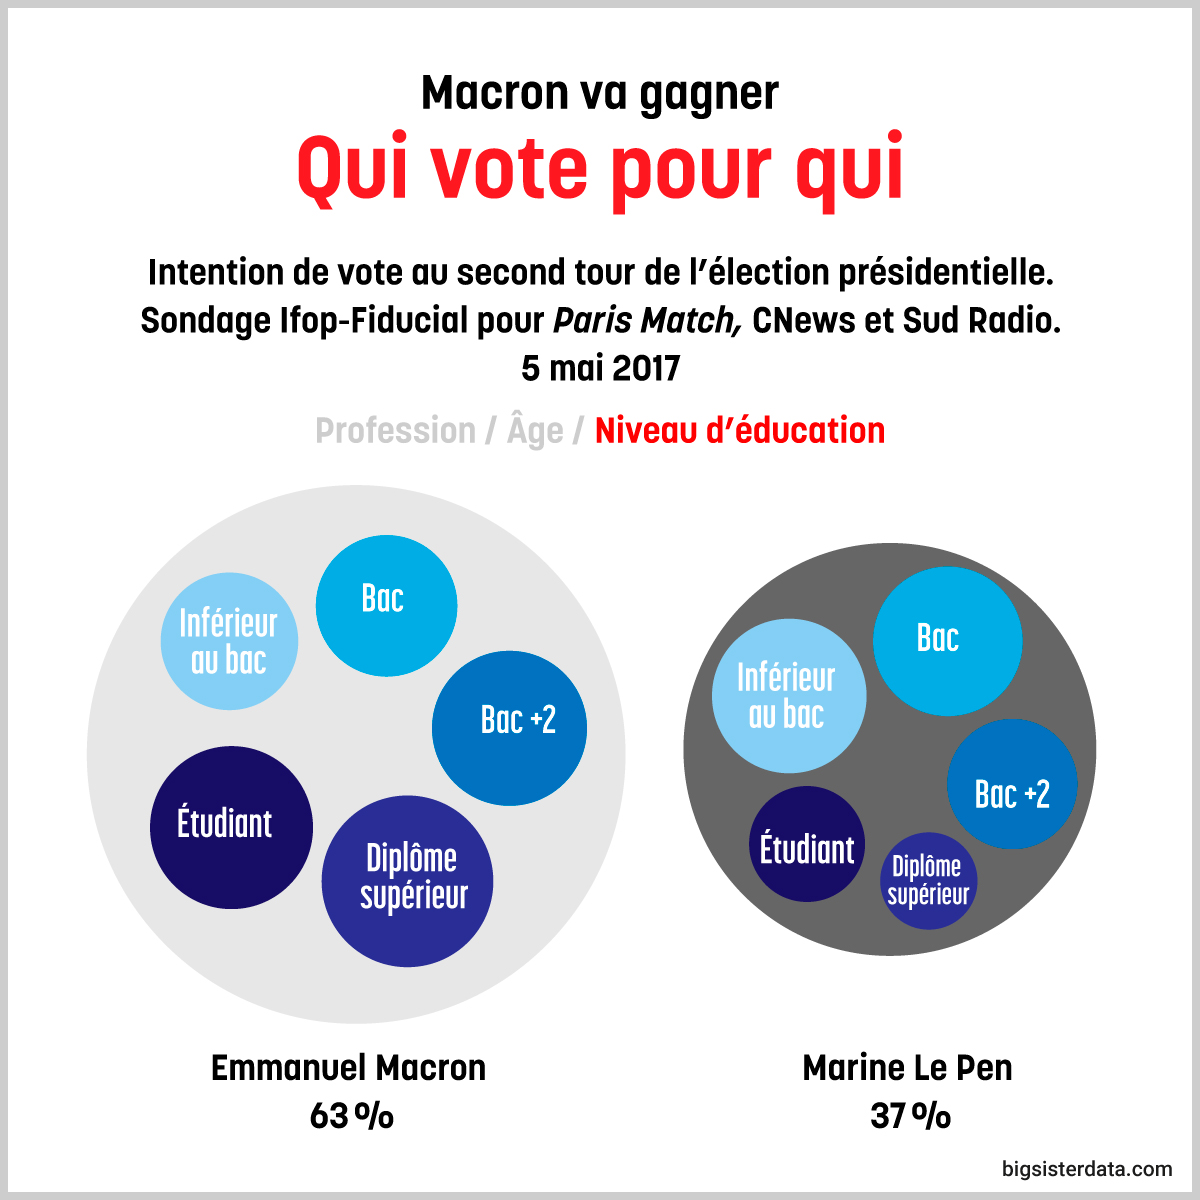 Macron va gagner